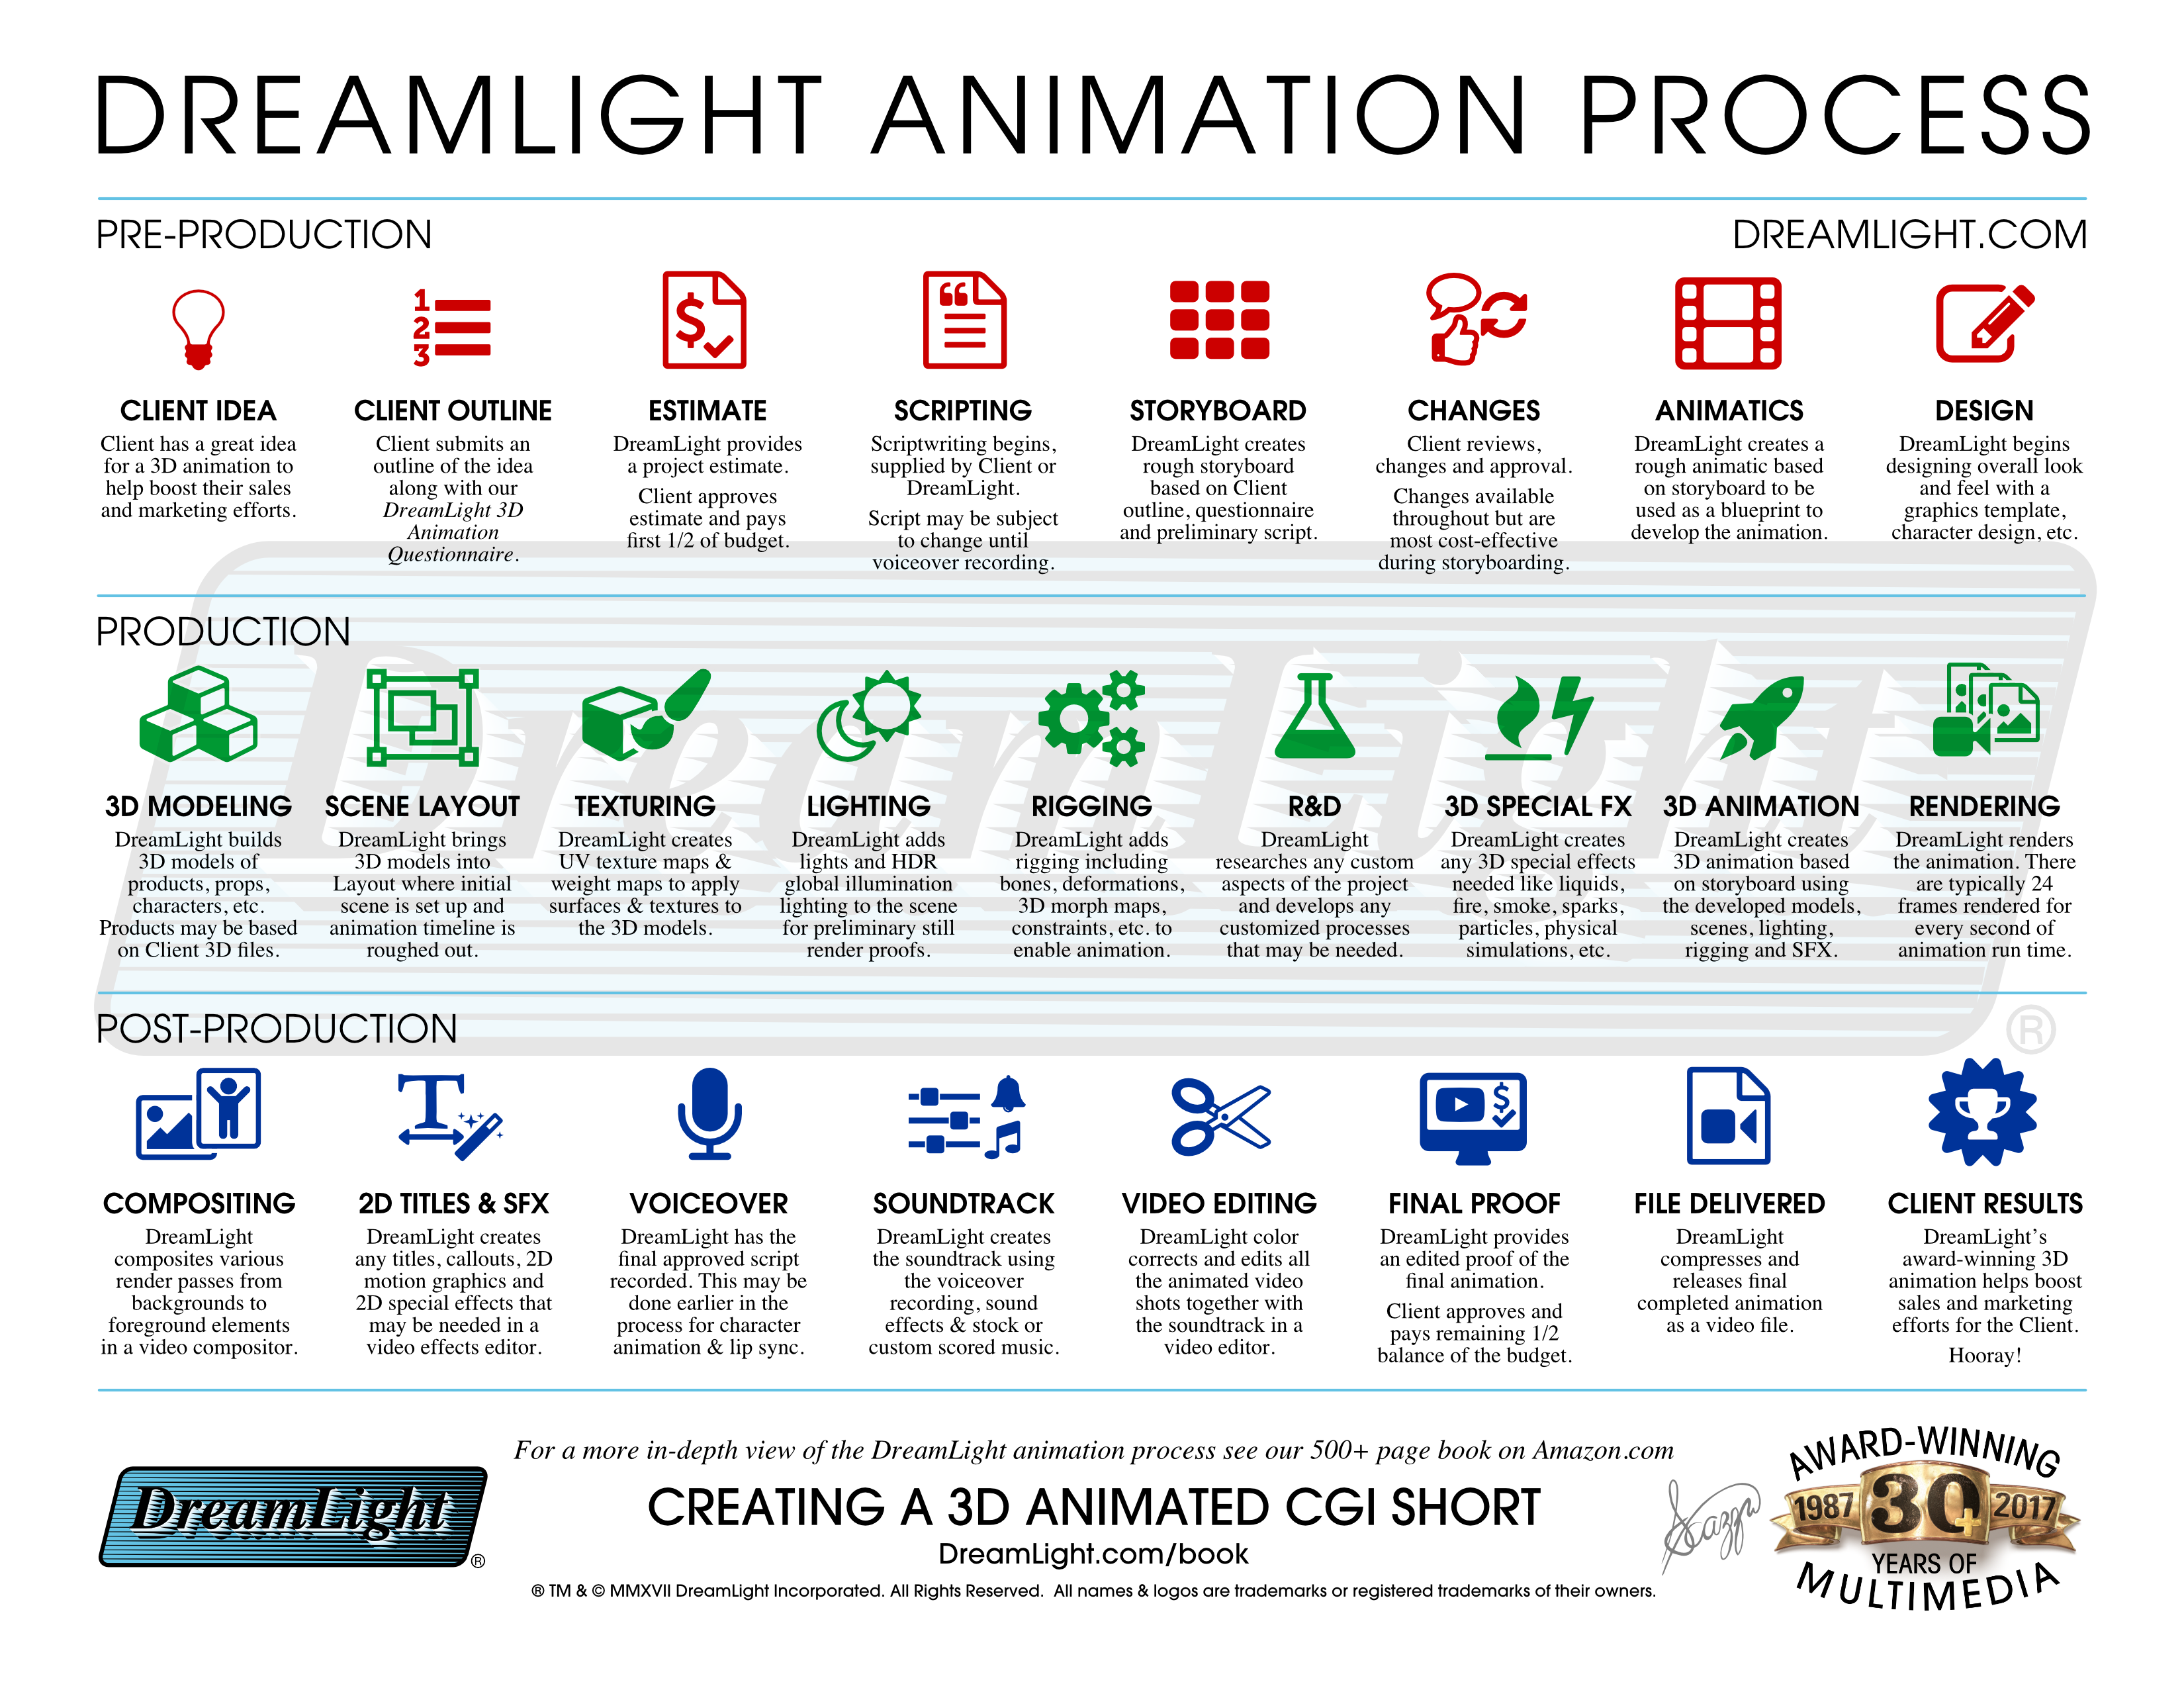 3D CGI Animation Production Process - DreamLight com